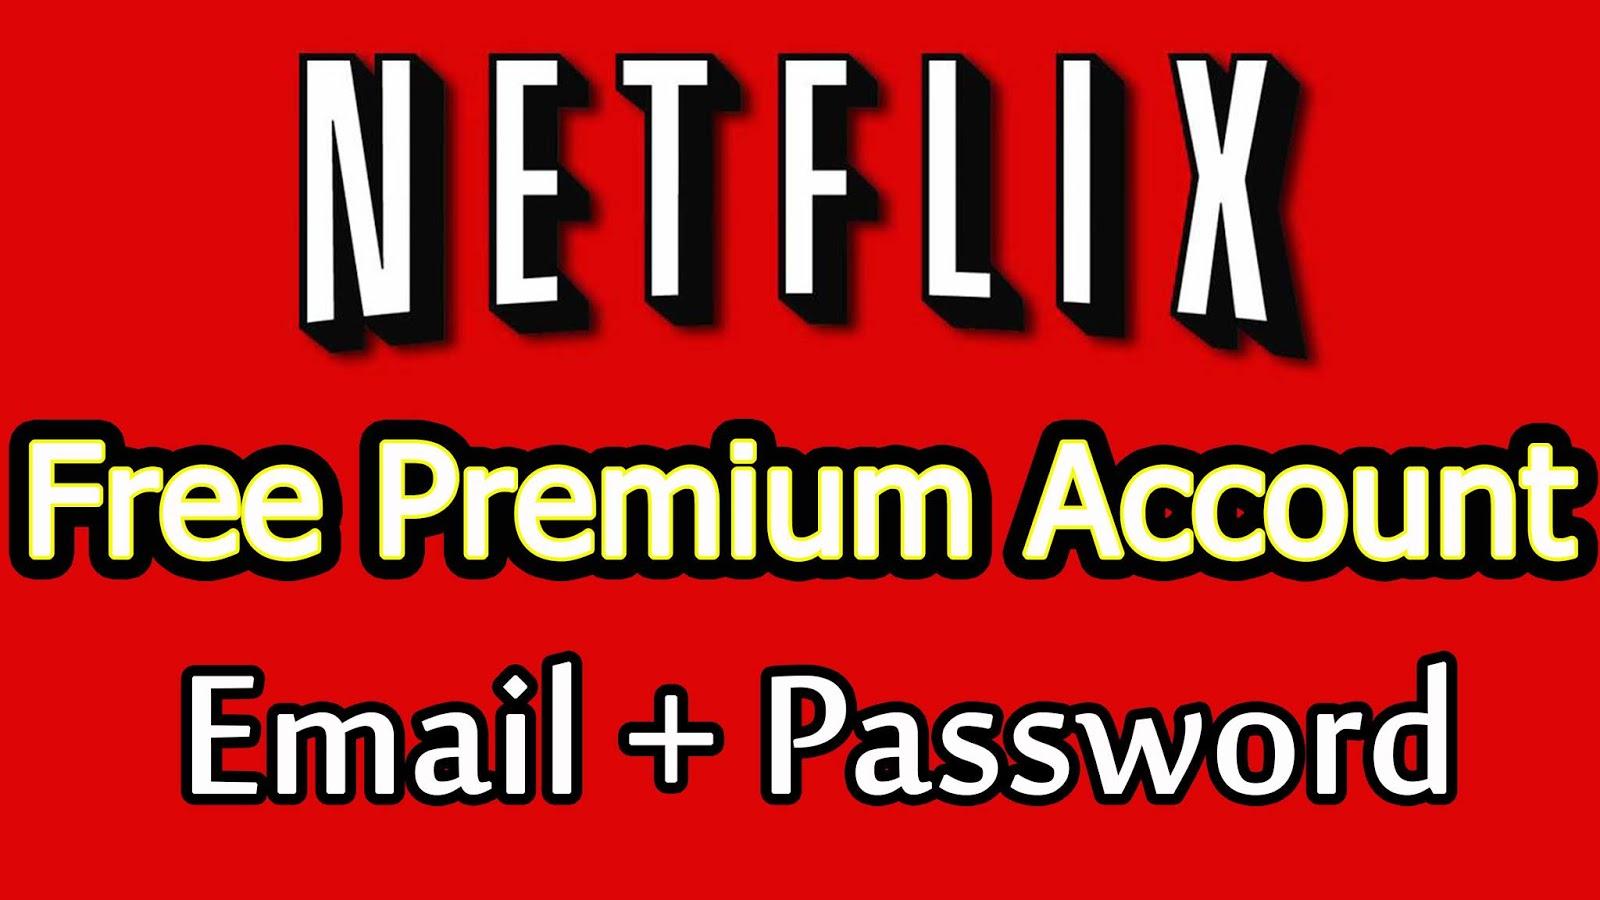 Free Netflix Premium Account 2019 (EMAIL + PASSWORD)